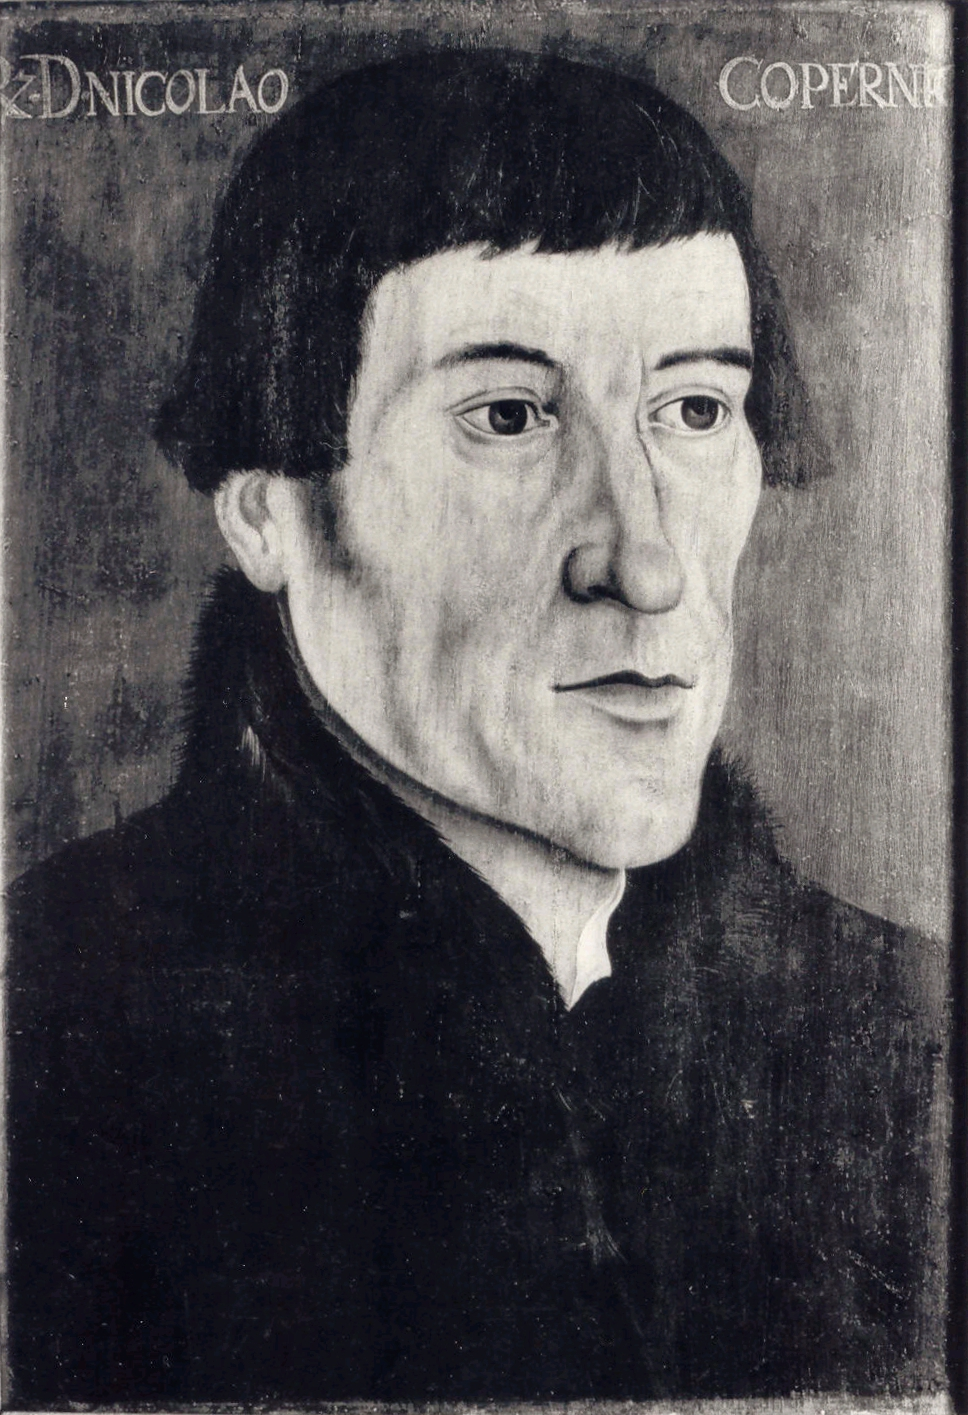 Nicholas Copernicus Astronomy - Pics about space